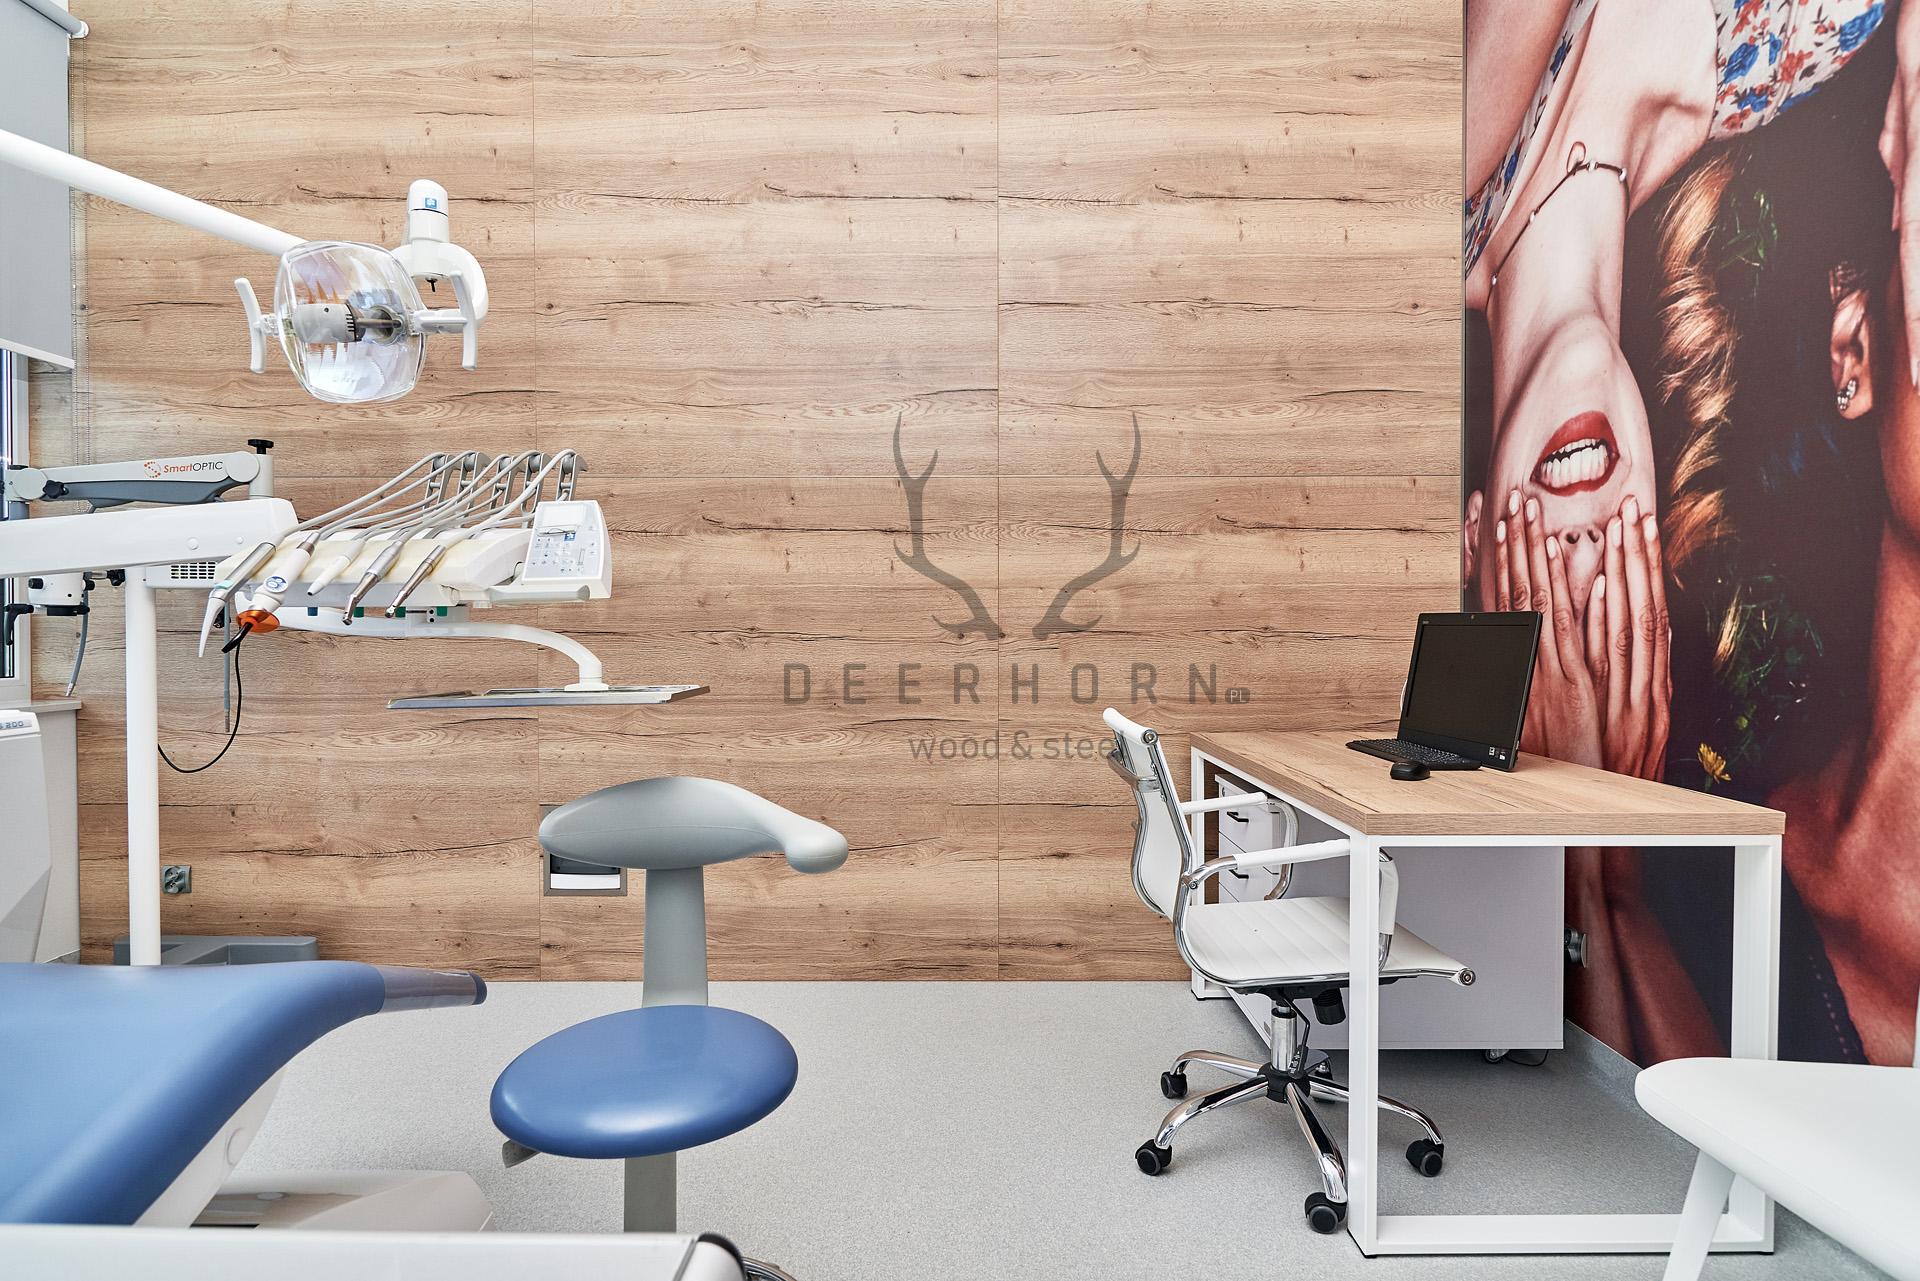 meble loftowe do gabinetu stomatologicznego